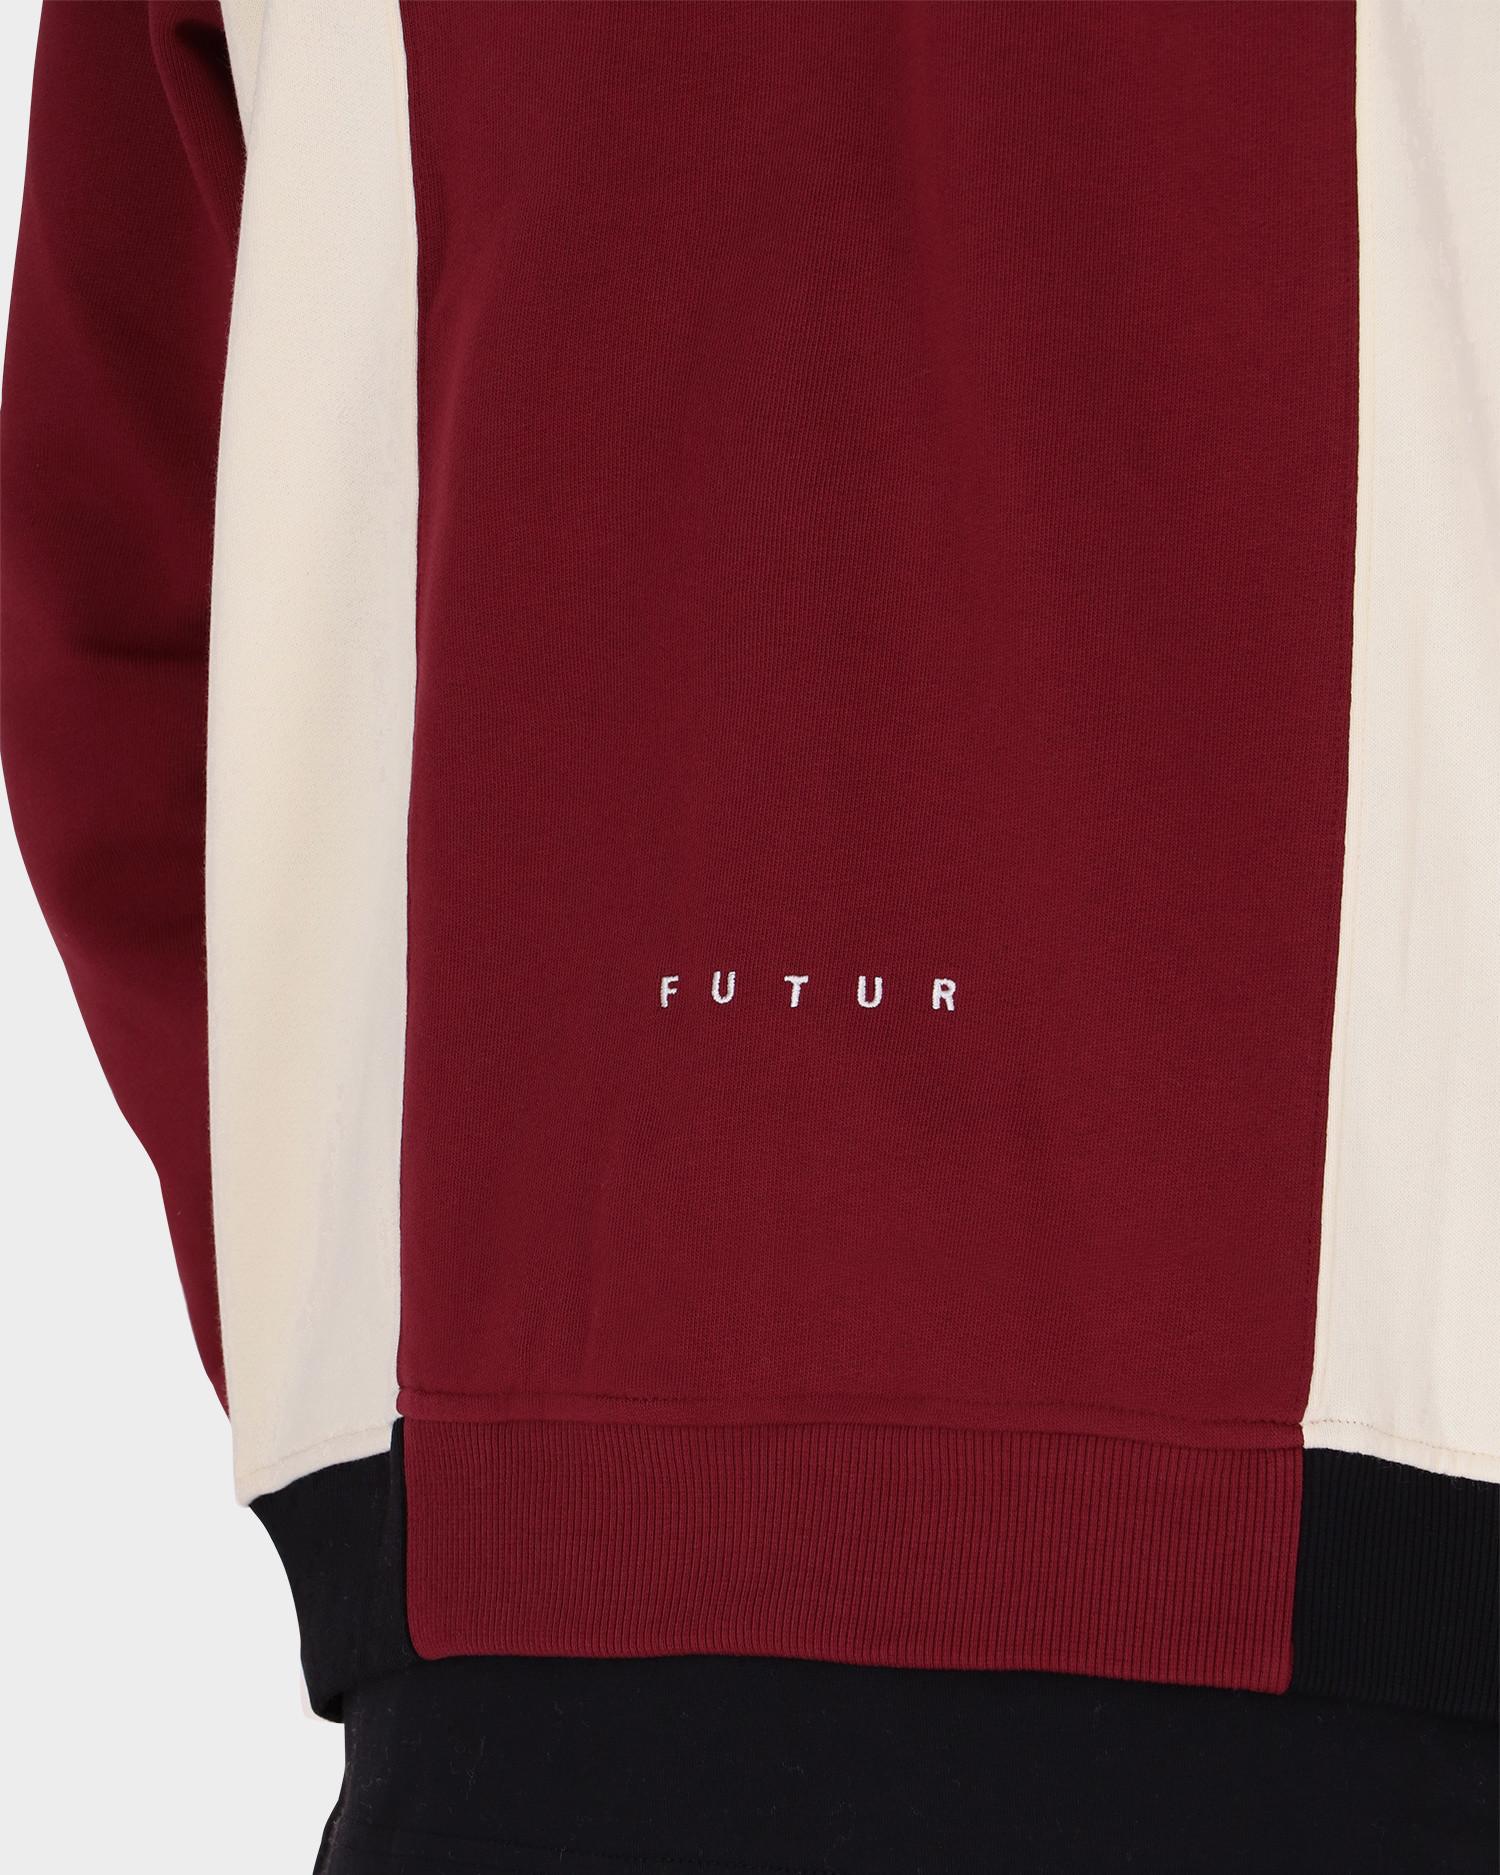 Futur Polo Zip-Up Top Dark Red